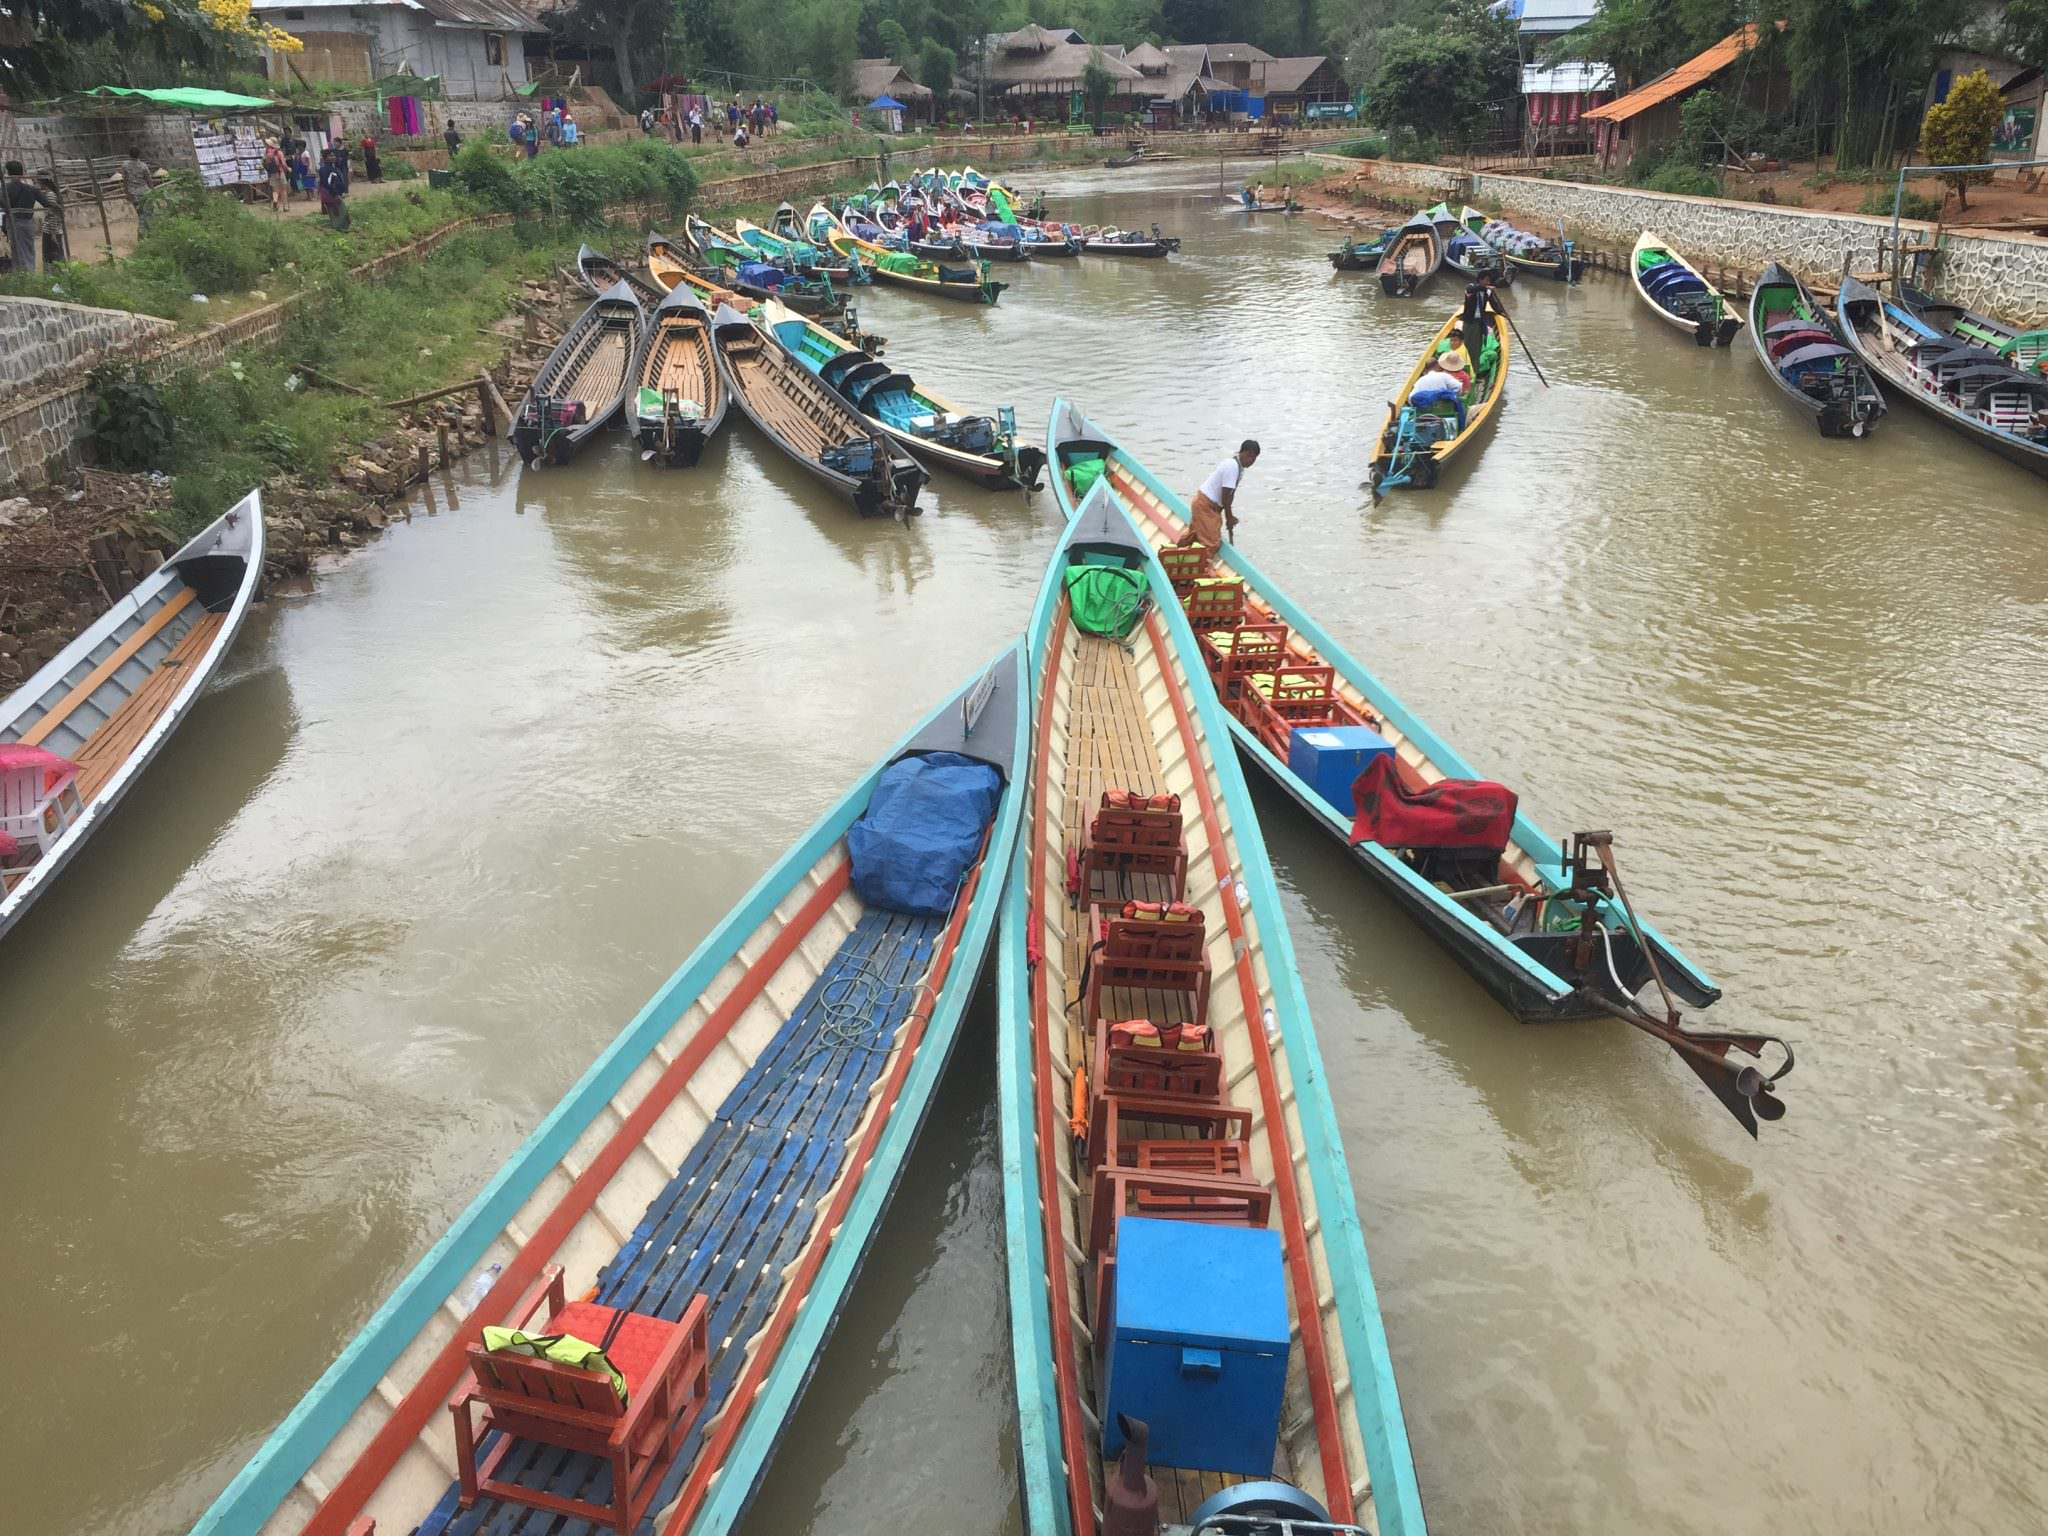 The Burmese Uber awaits. © 2015 Gail Jessen